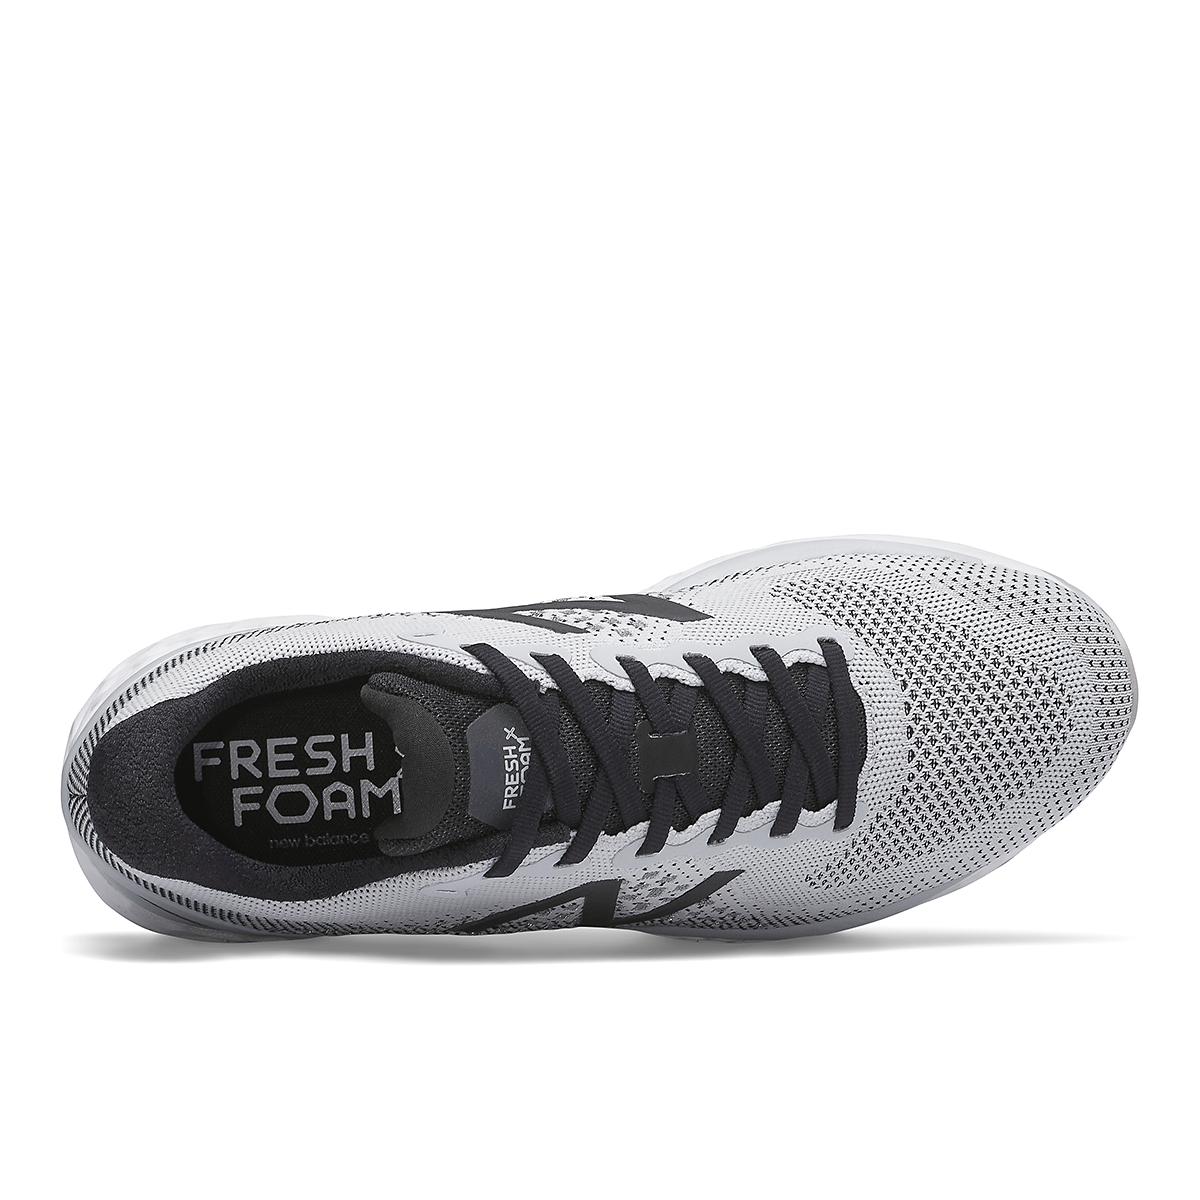 Men's New Balance 880V10 Running Shoe - Color: Light Aluminum - Size: 7 - Width: Wide, Light Aluminum, large, image 3